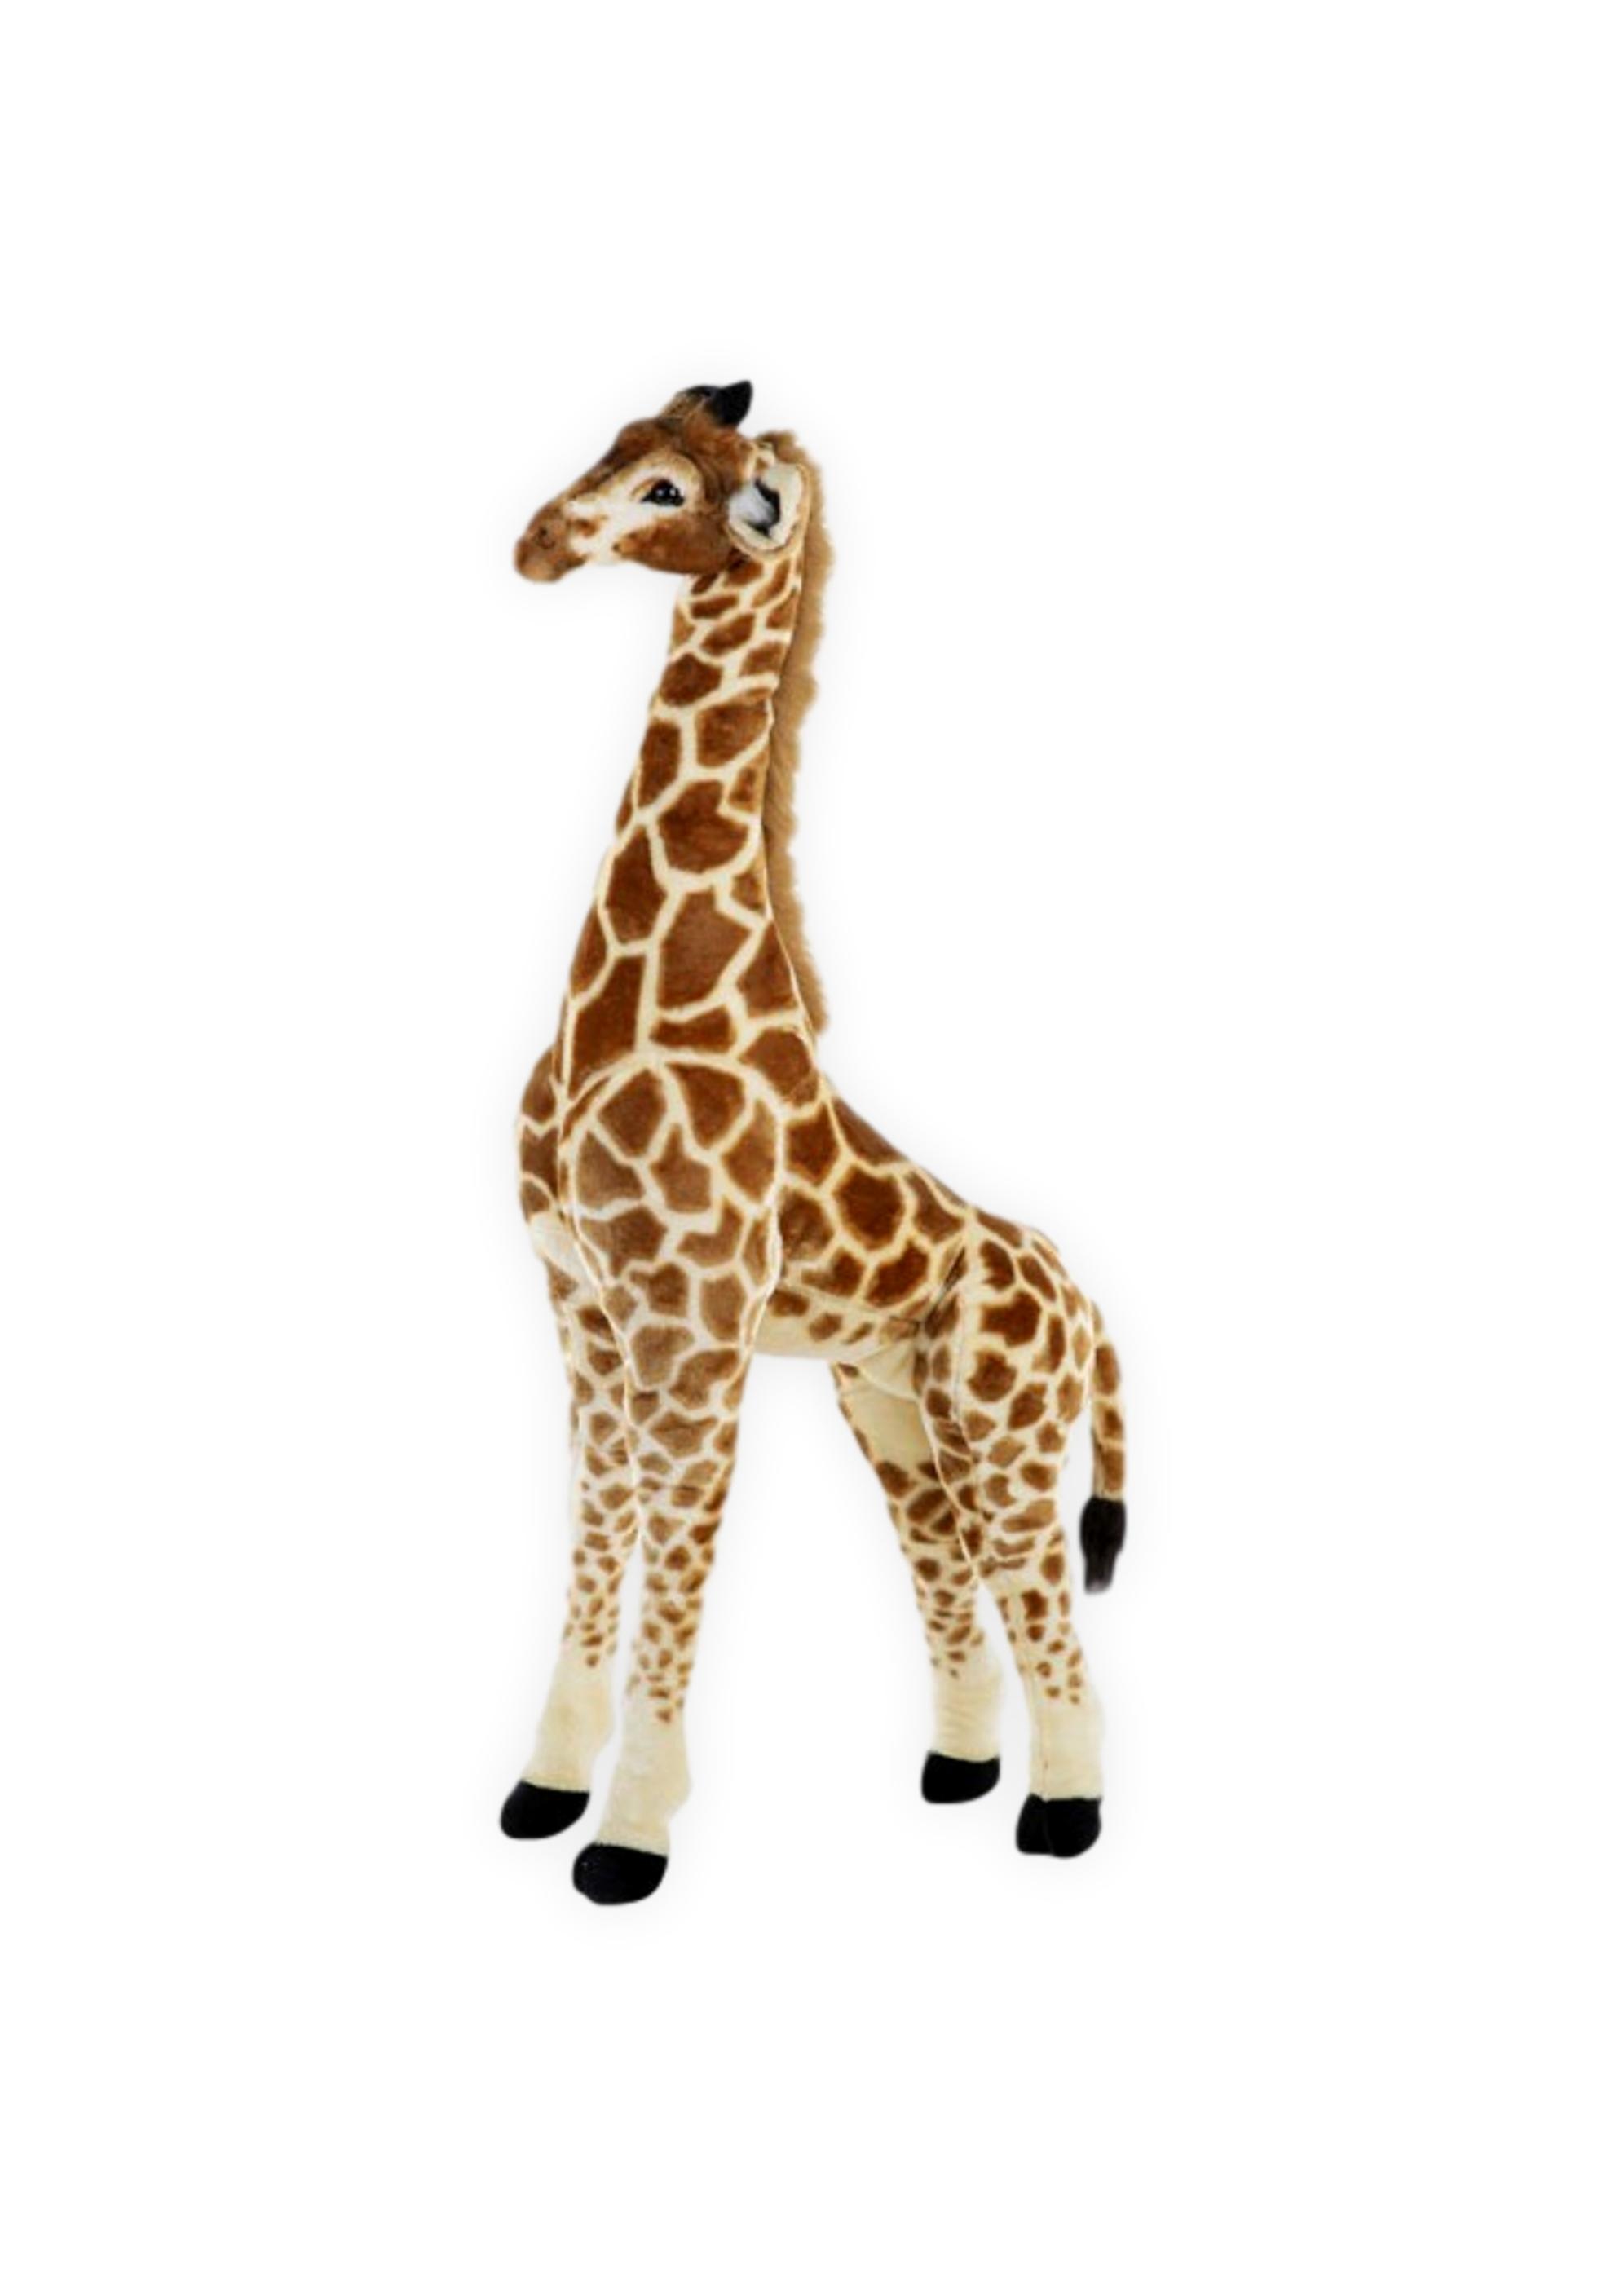 d2119312dc62ca Childhome - Giraf Knuffel 135 cm | Boutique Toys